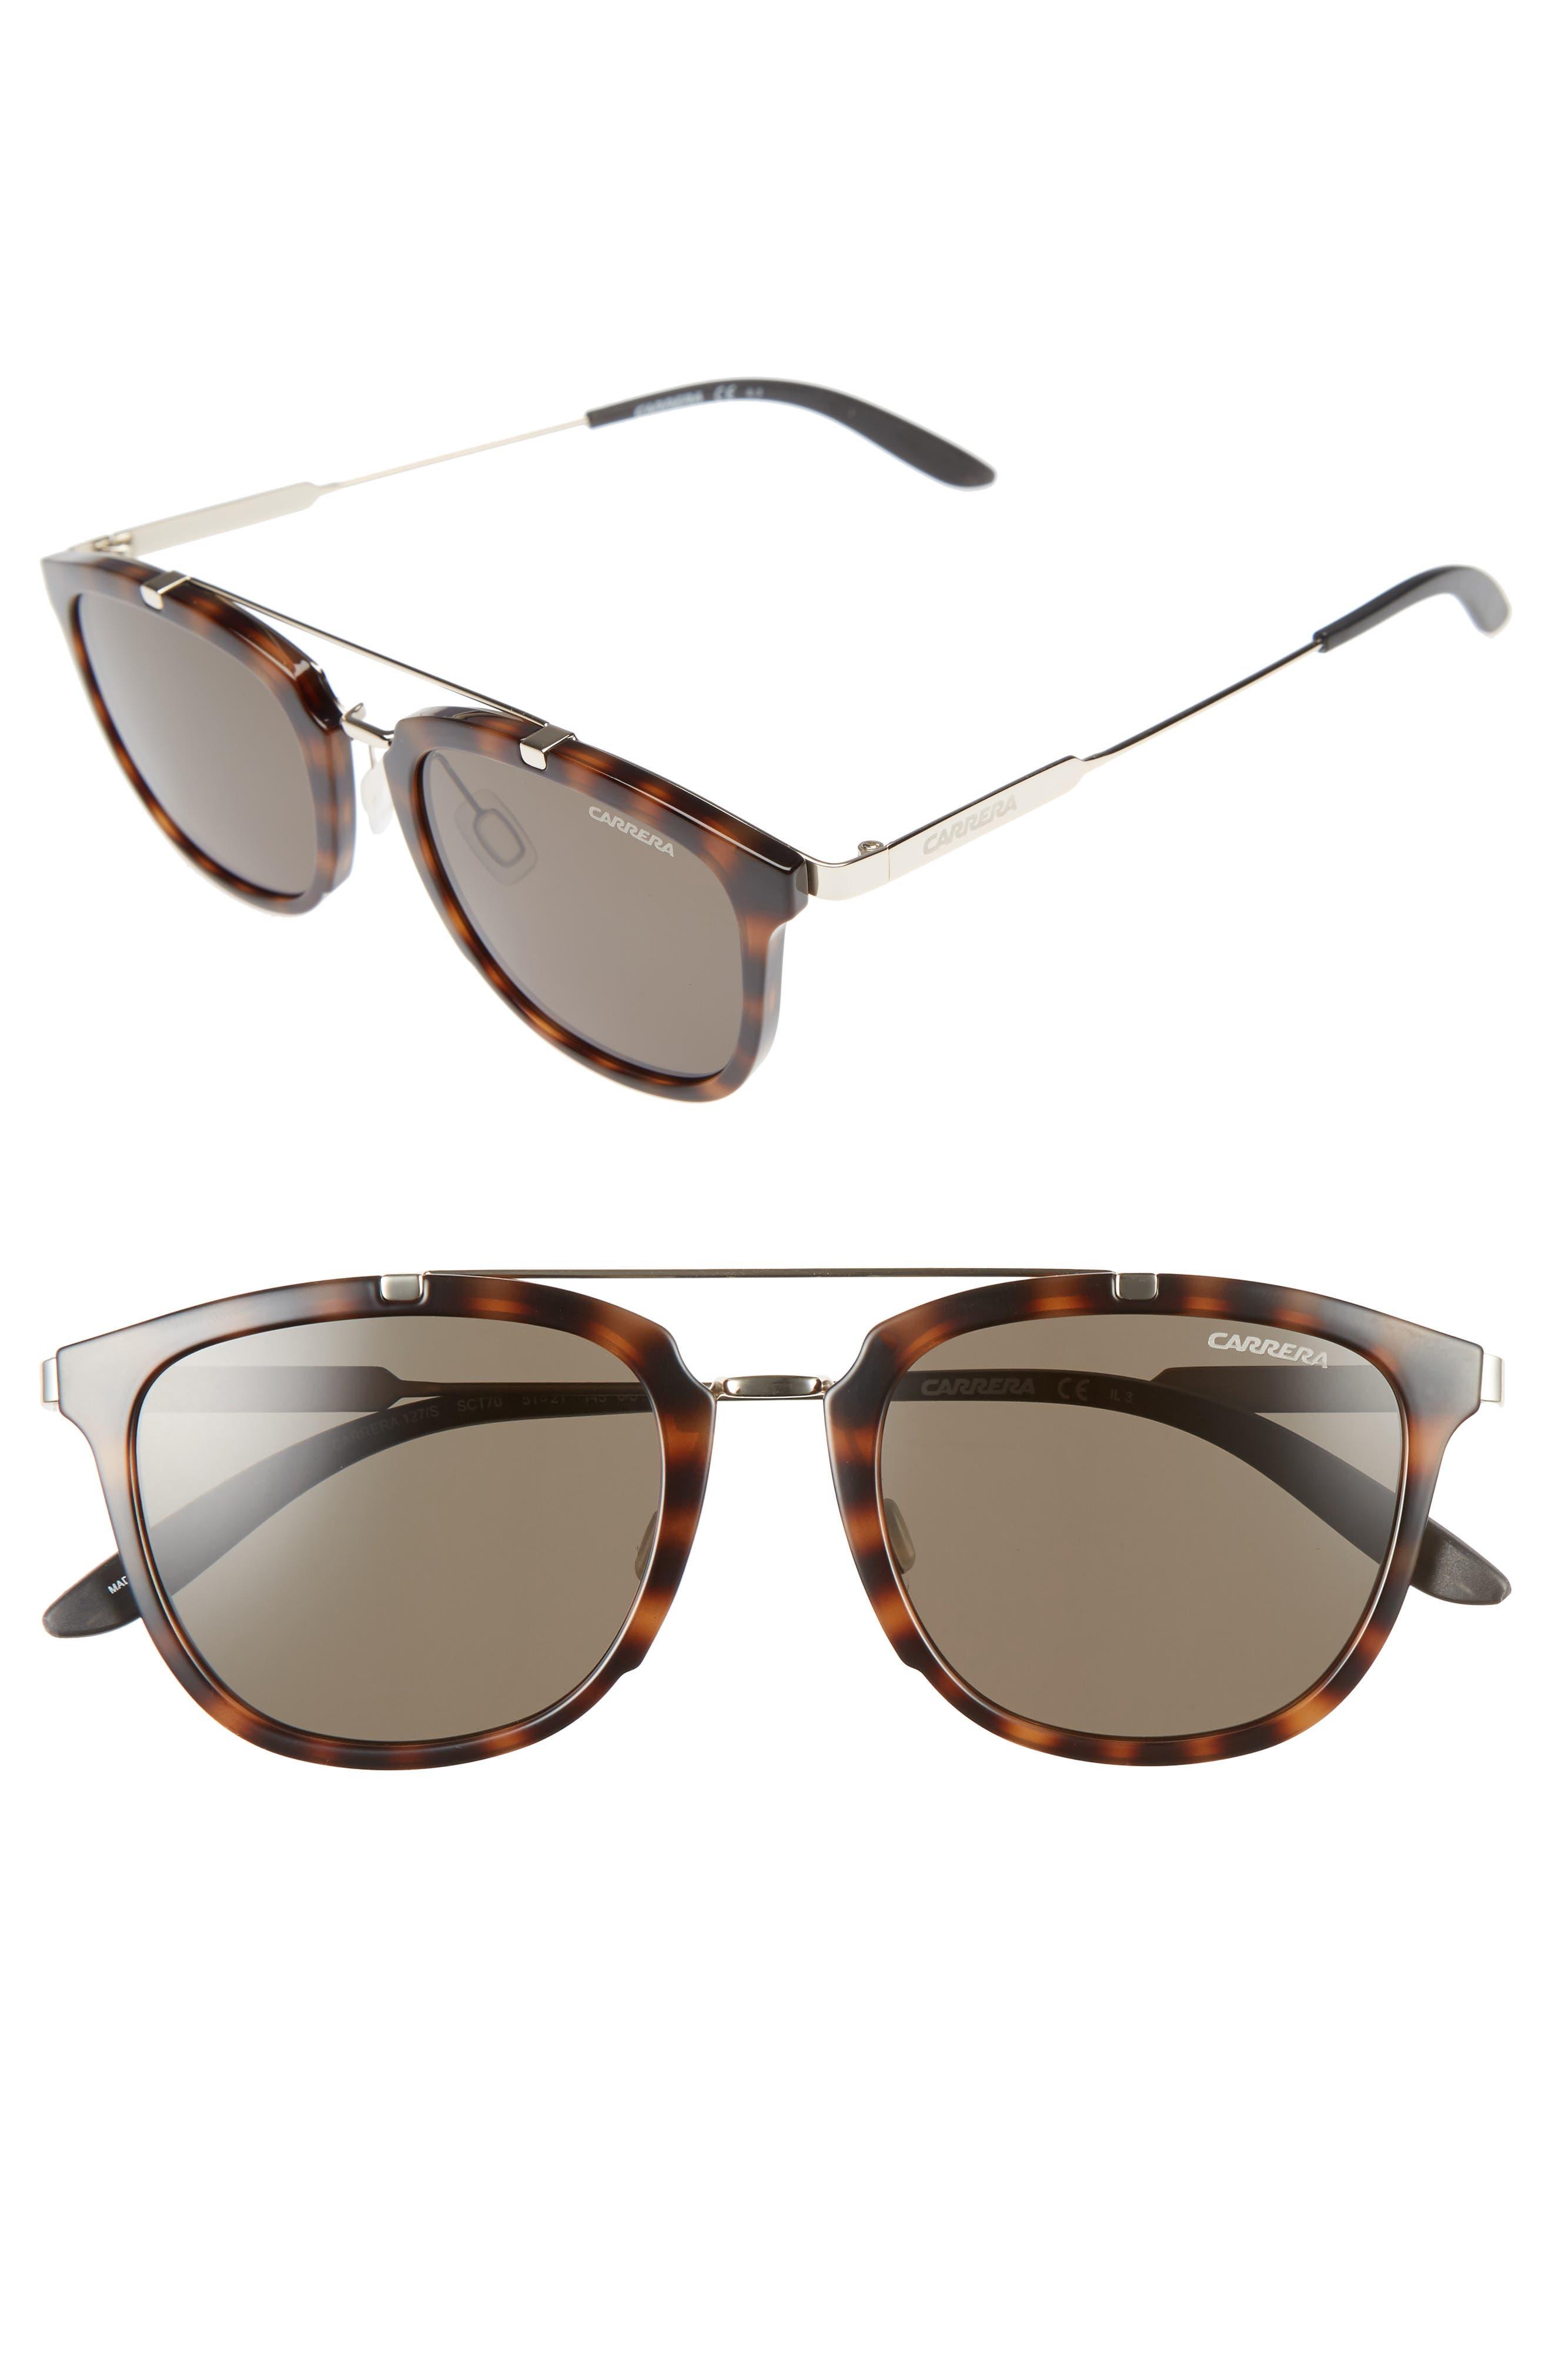 Carrera Eyewear 51mm Retro Sunglasses